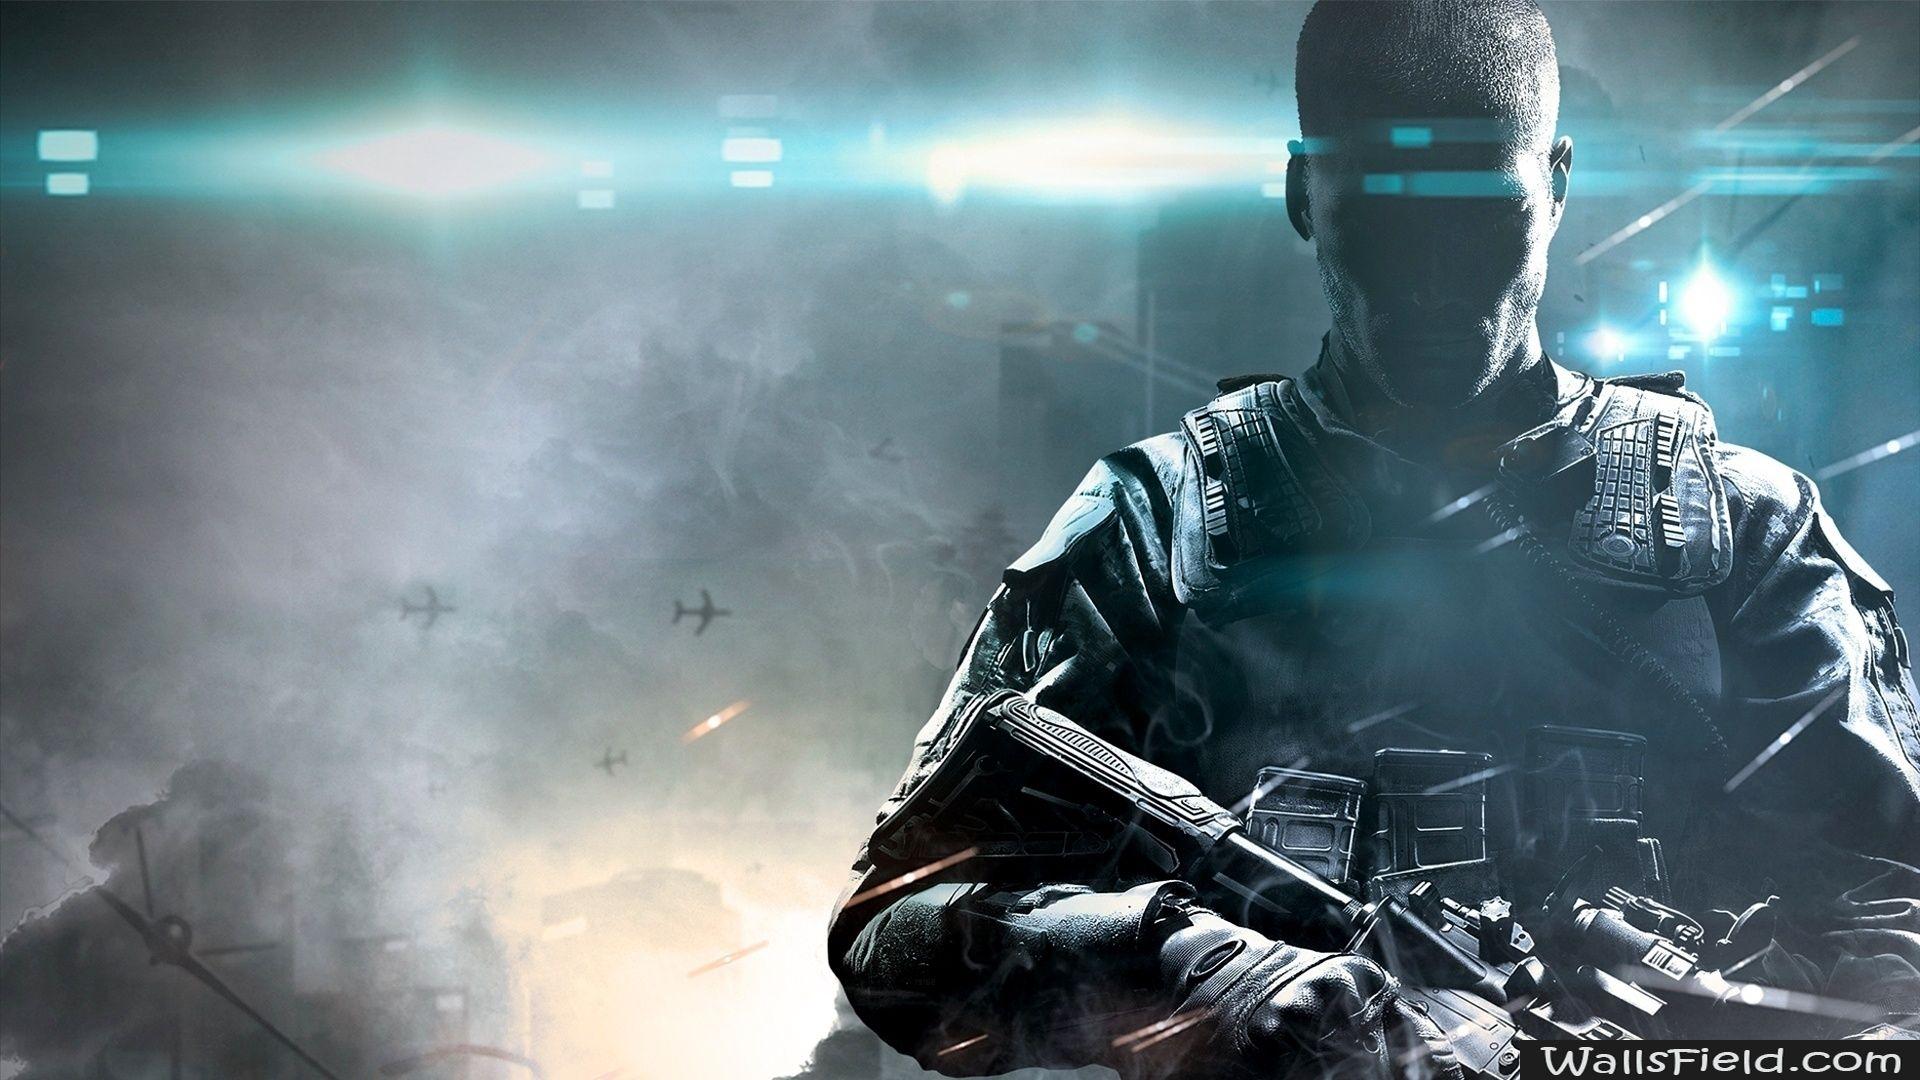 Call Of Duty Black Ops 2 Wallsfield Com Free Hd Wallpapers Call Of Duty Black Black Ops Call Of Duty